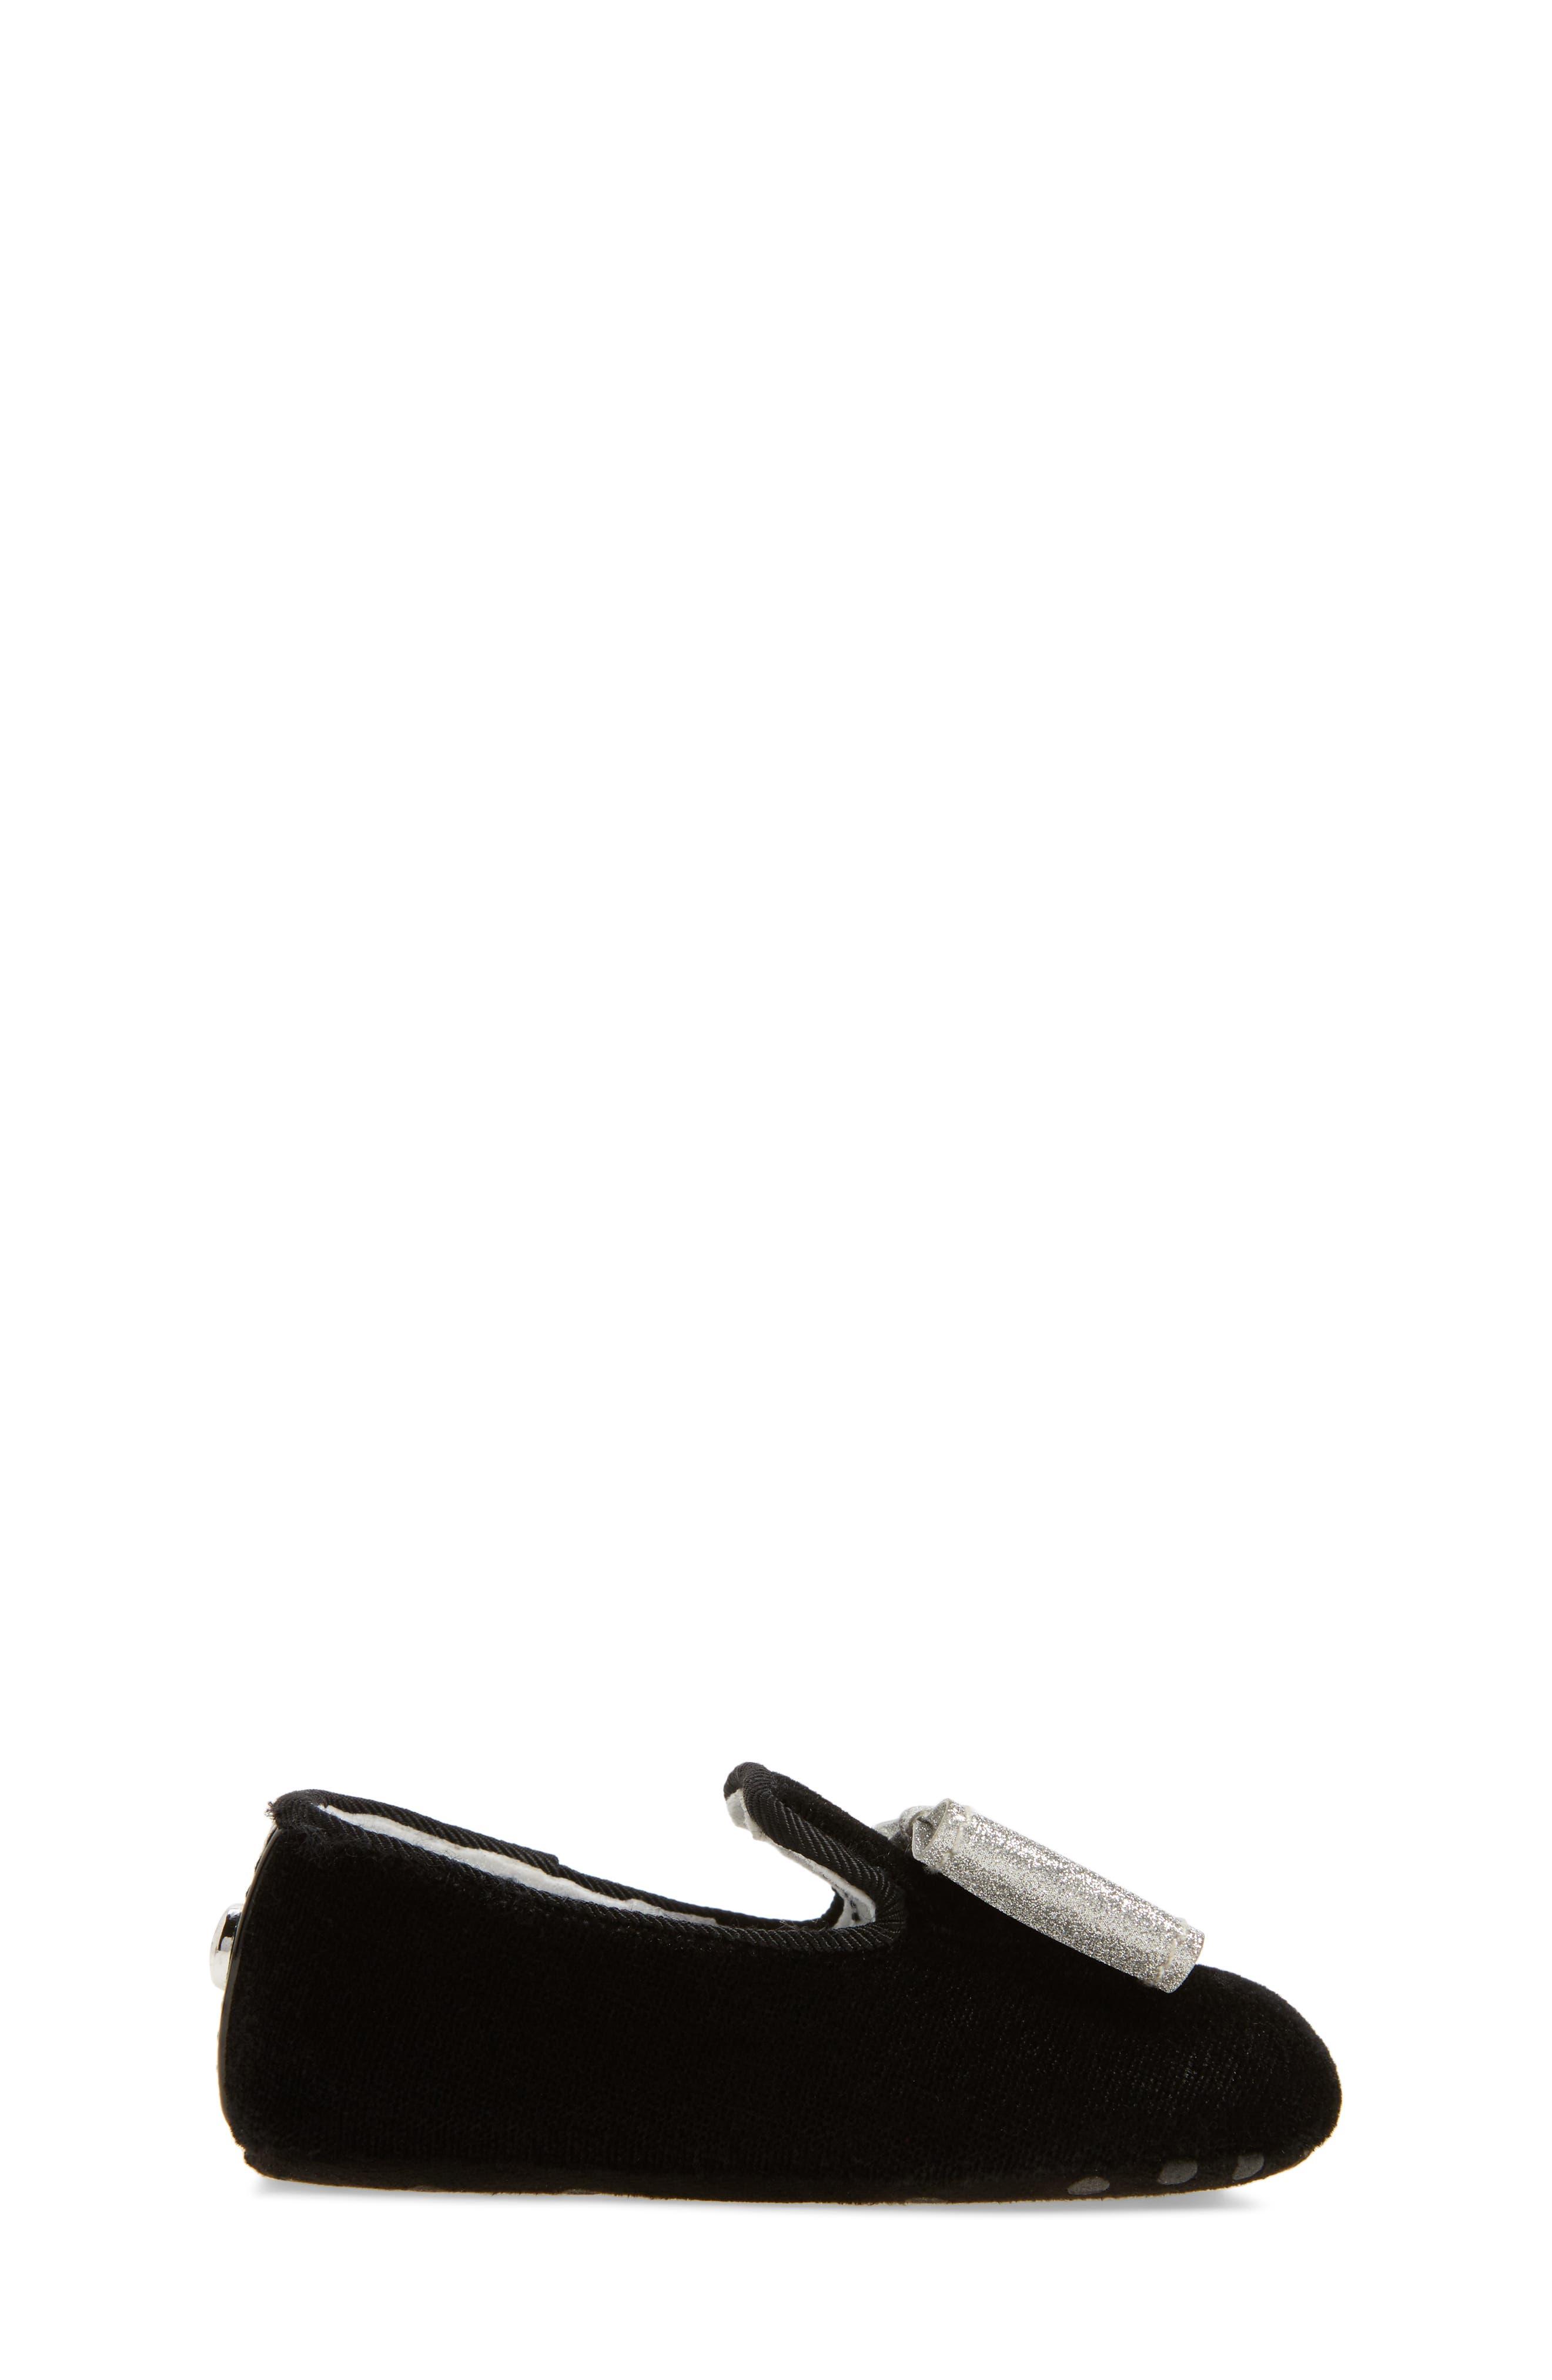 Bow Loafer Crib Shoe,                             Alternate thumbnail 3, color,                             012